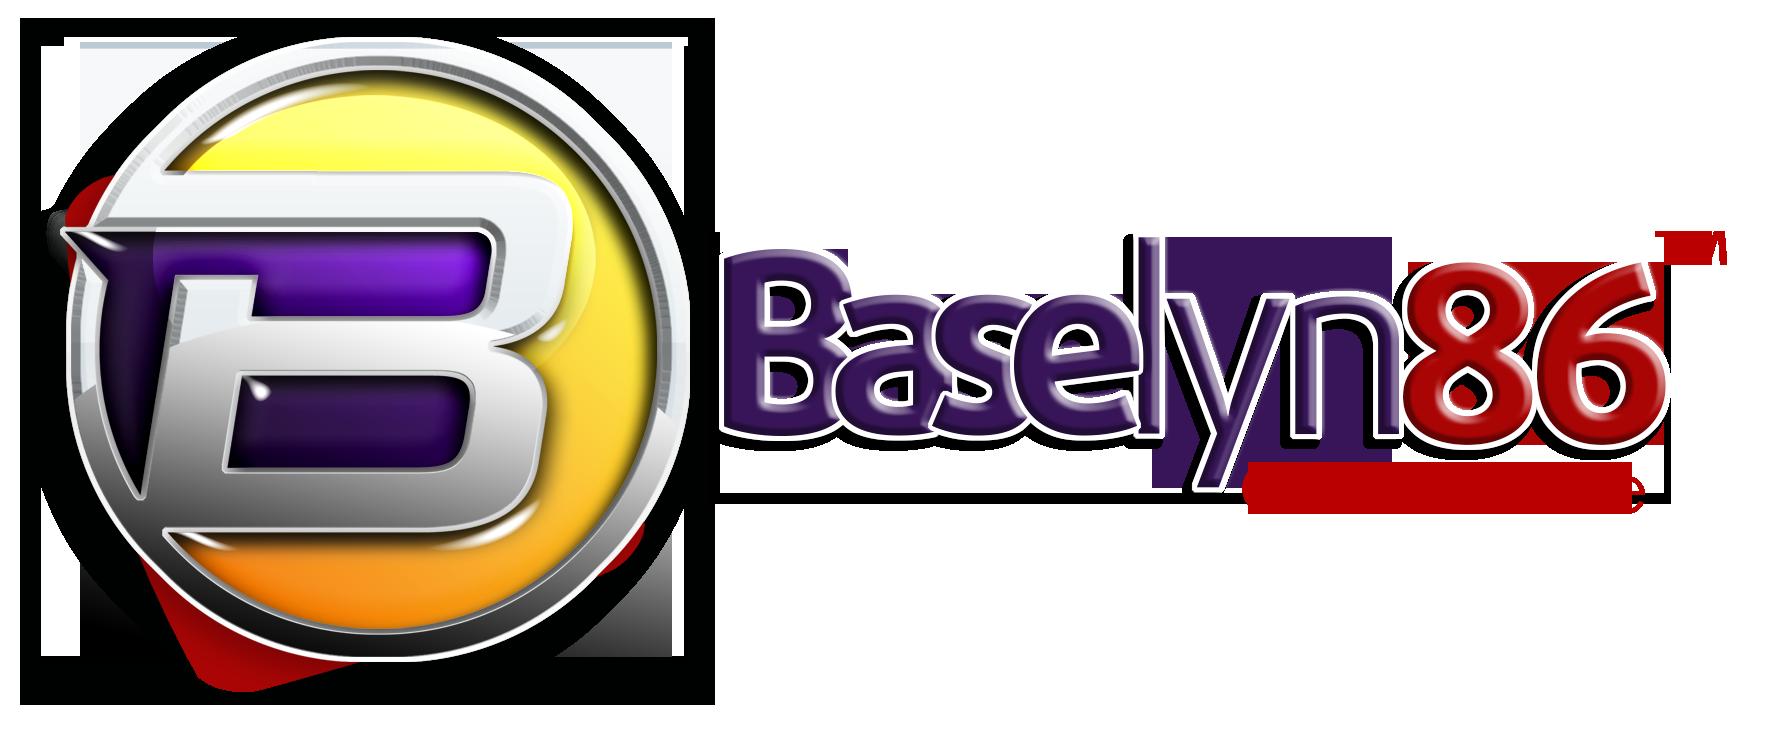 Baselyn86